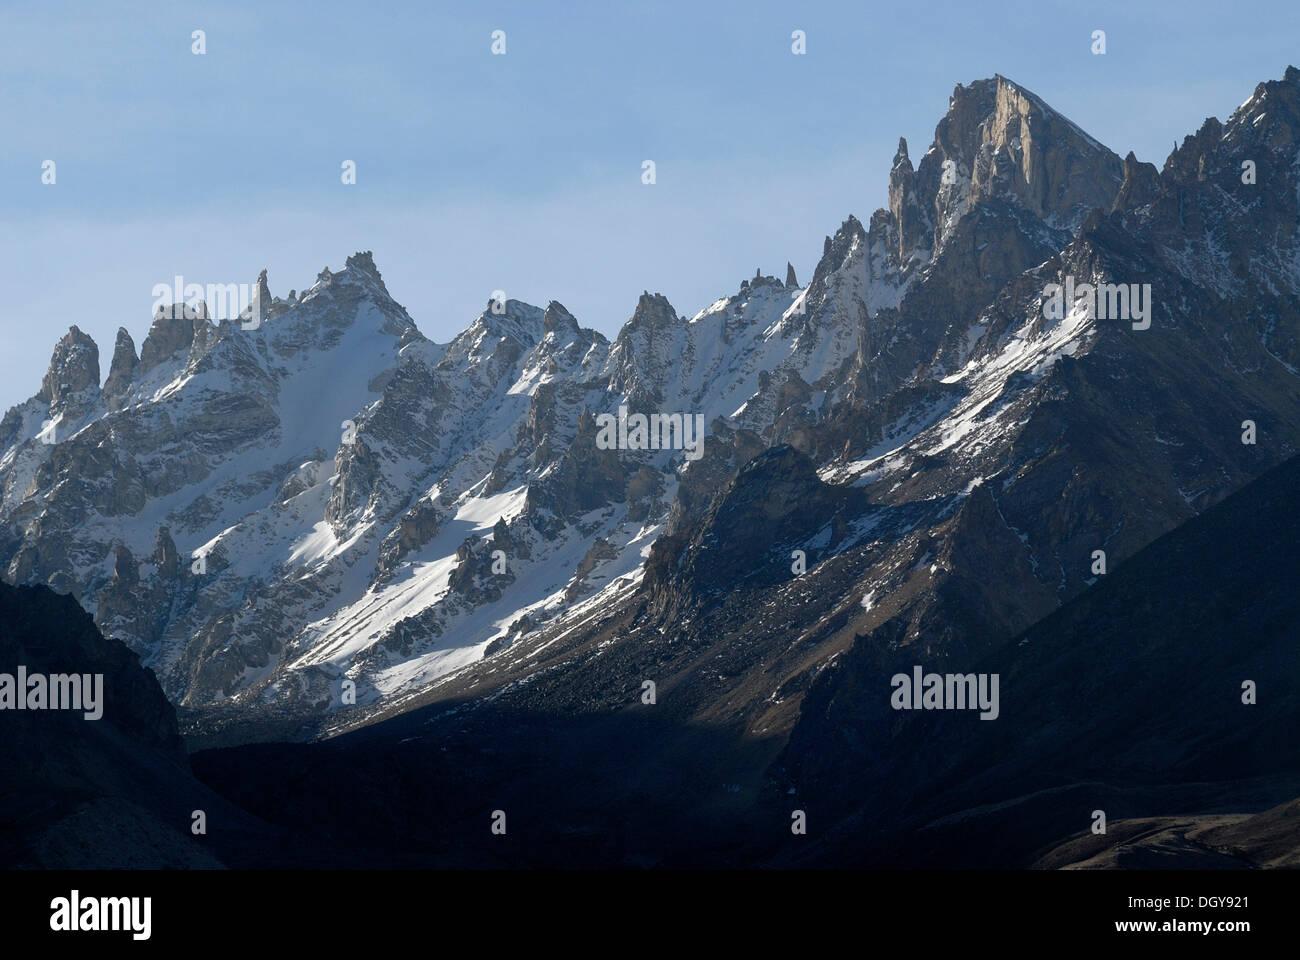 Himalayan main ridge with jagged snow-capped rocks on route from the Taron-la-Pass, Tingri, Nyalam, Tibet, China, Asia - Stock Image